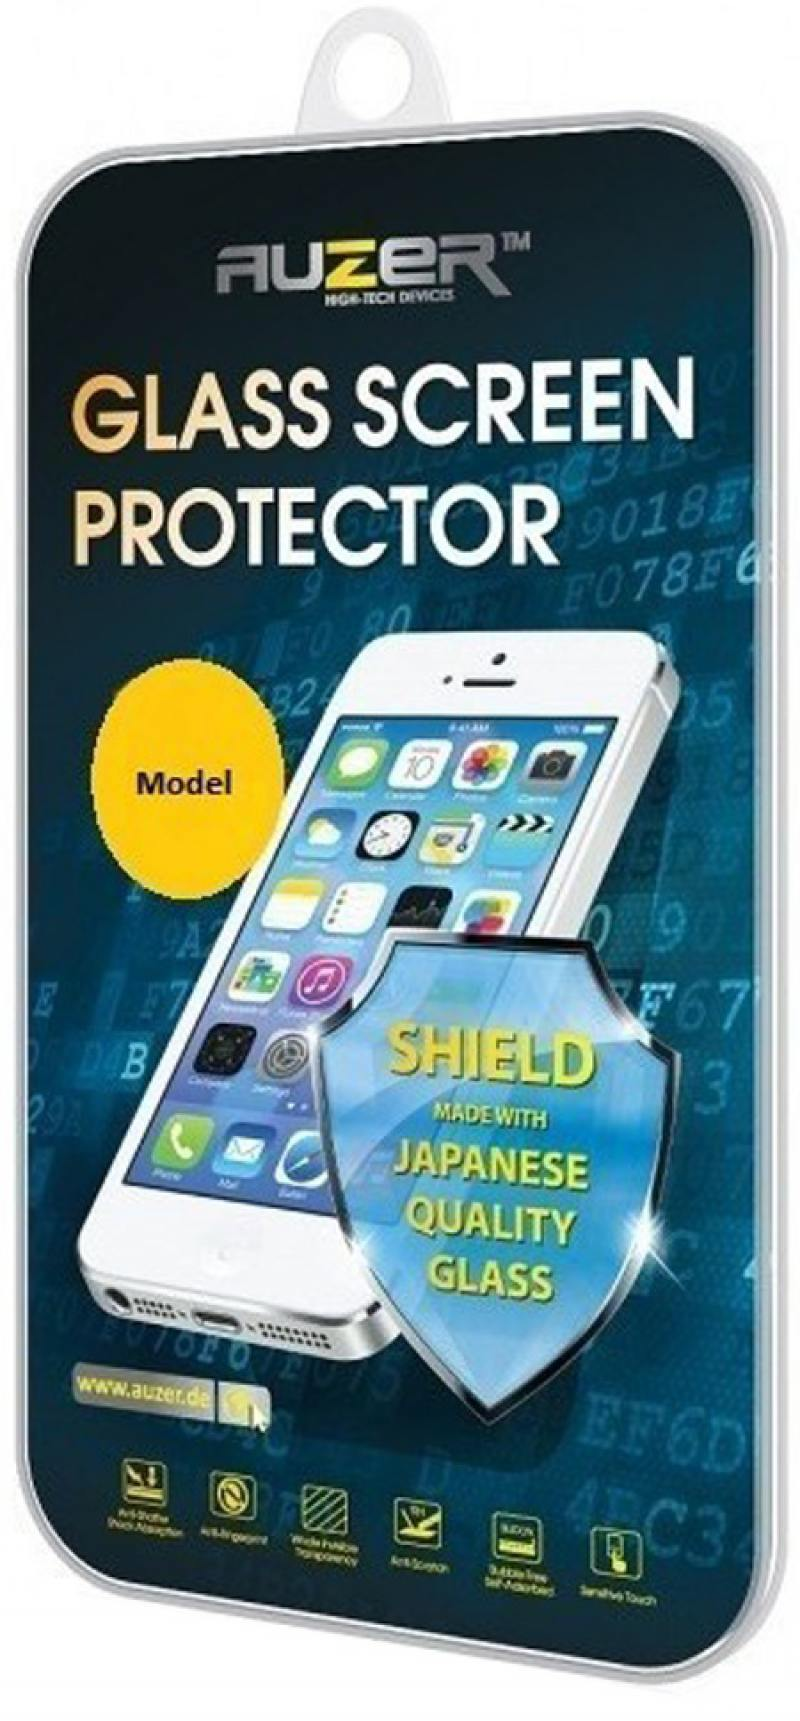 Защитное стекло Auzer AG-SAI 6 для iPhone 6 0.33 мм защитное стекло auzer ag ai7 apple iphone 7 plus